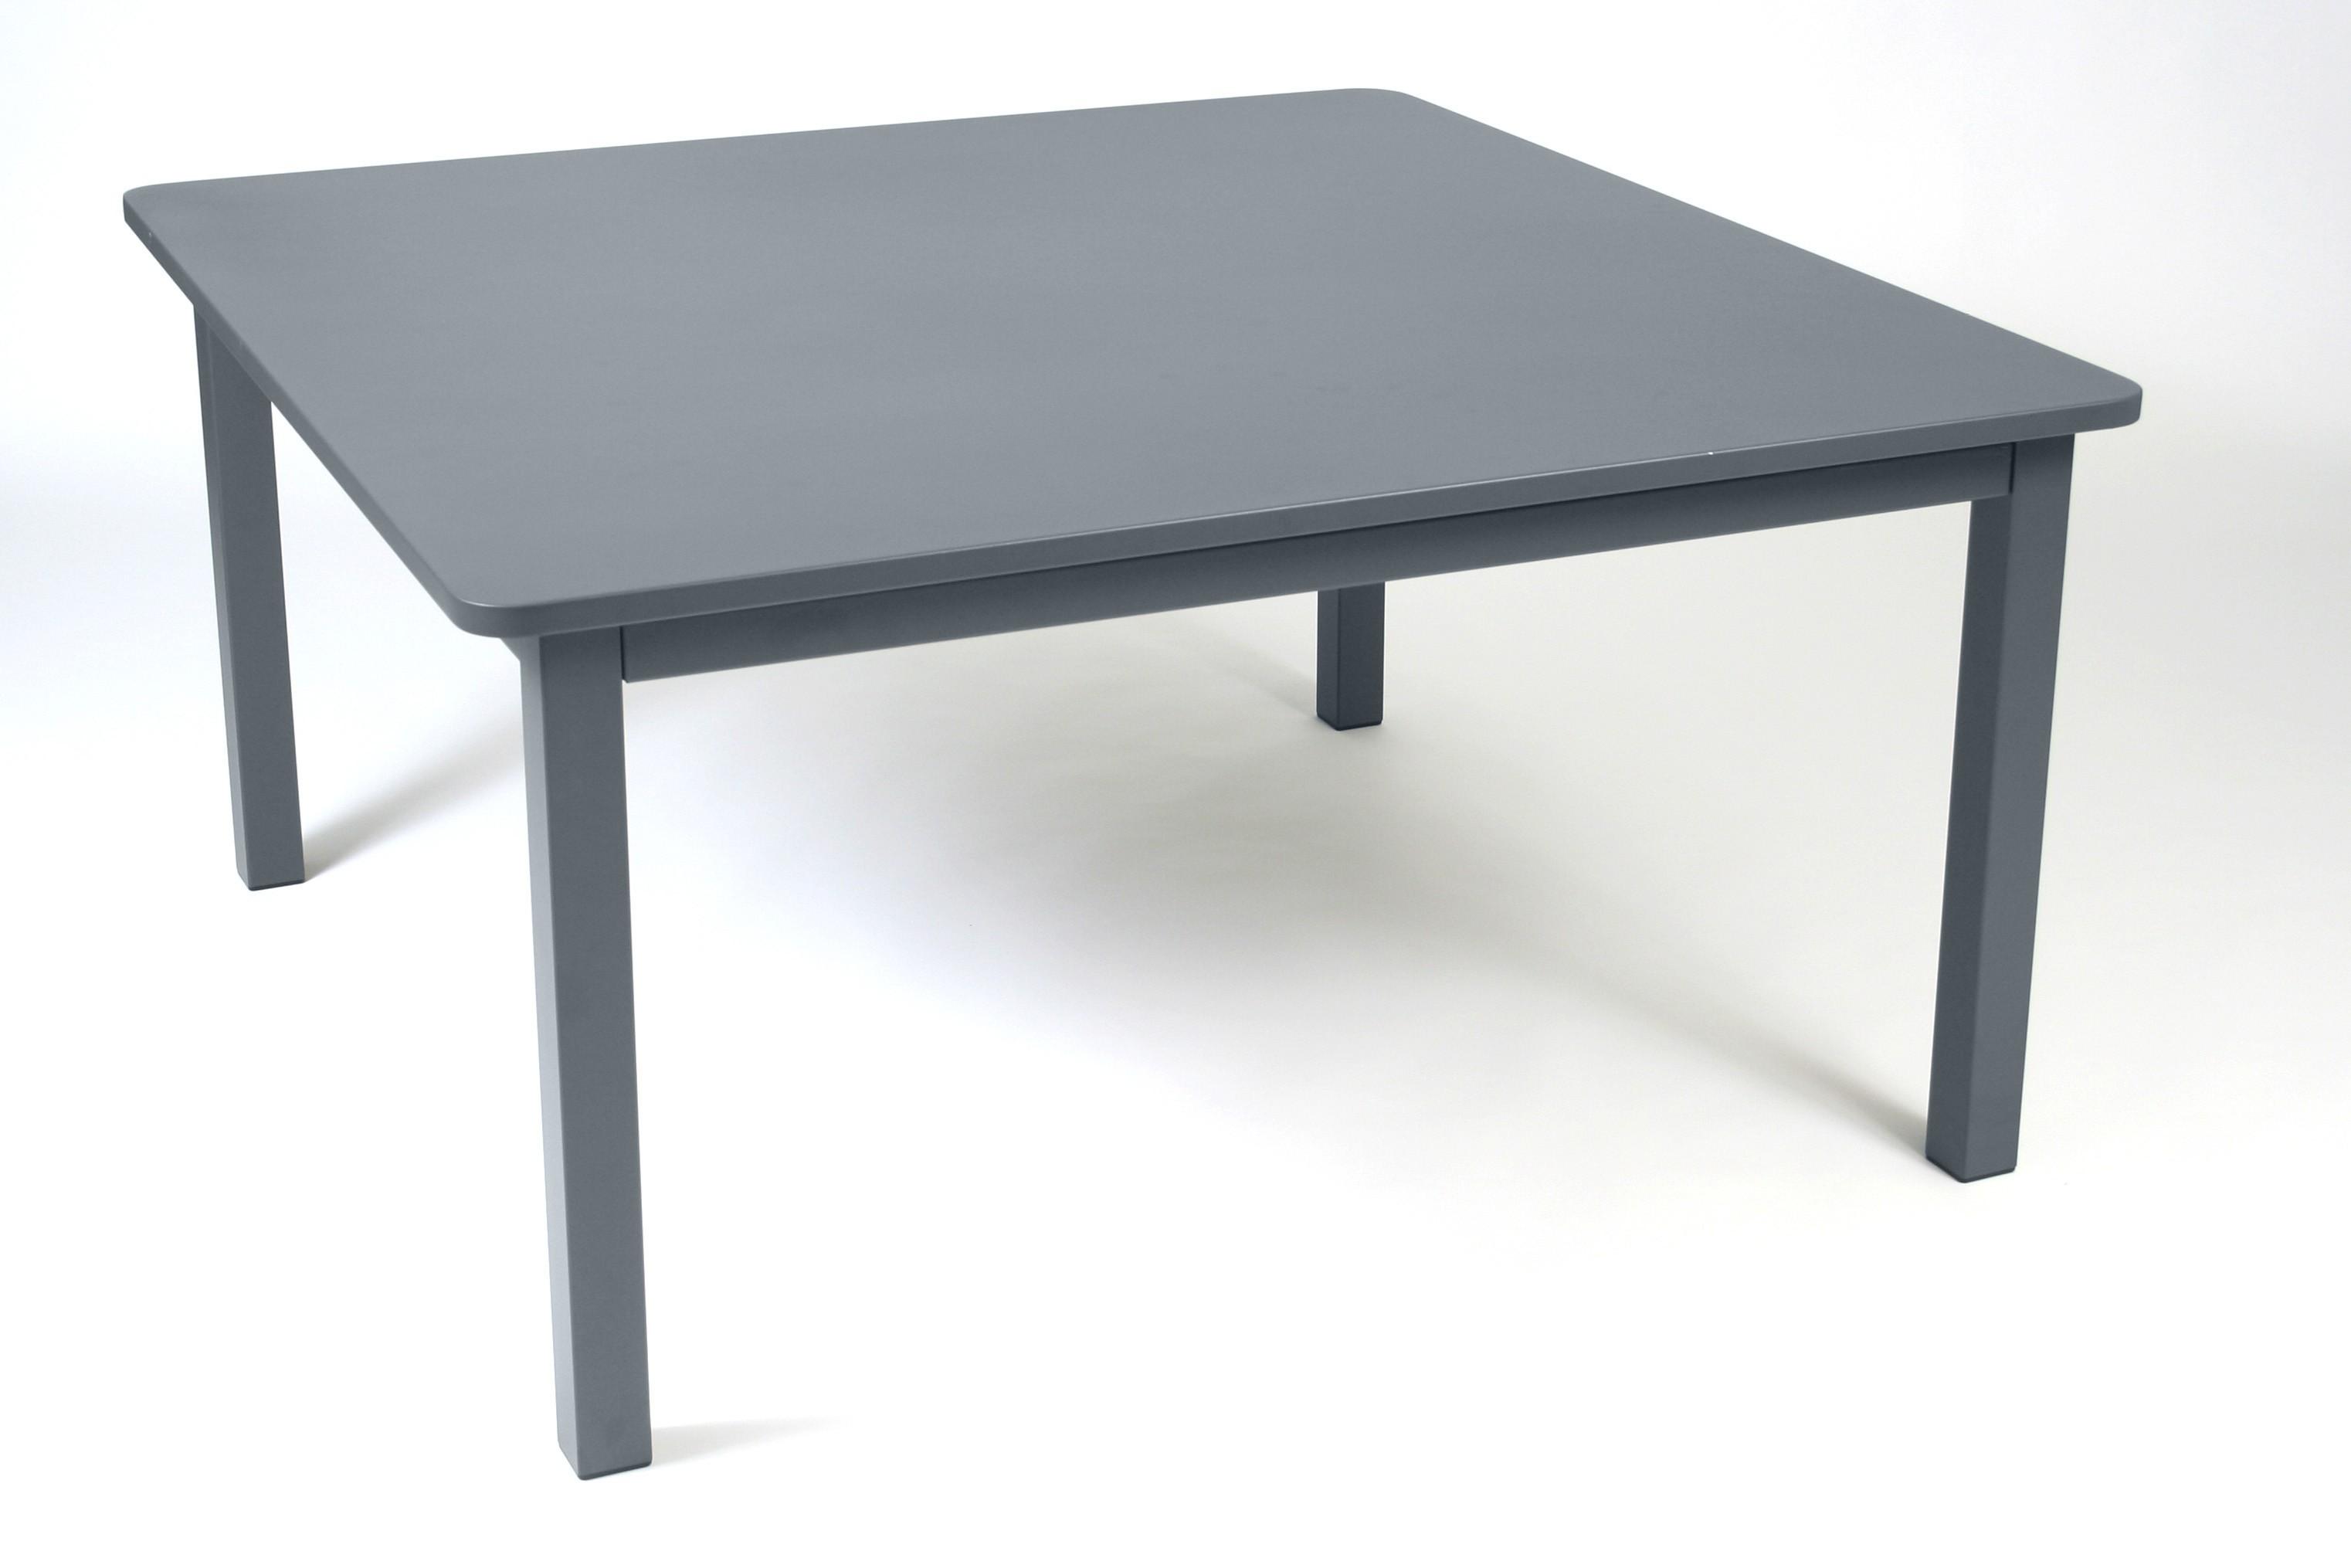 fermob moins cher. Black Bedroom Furniture Sets. Home Design Ideas